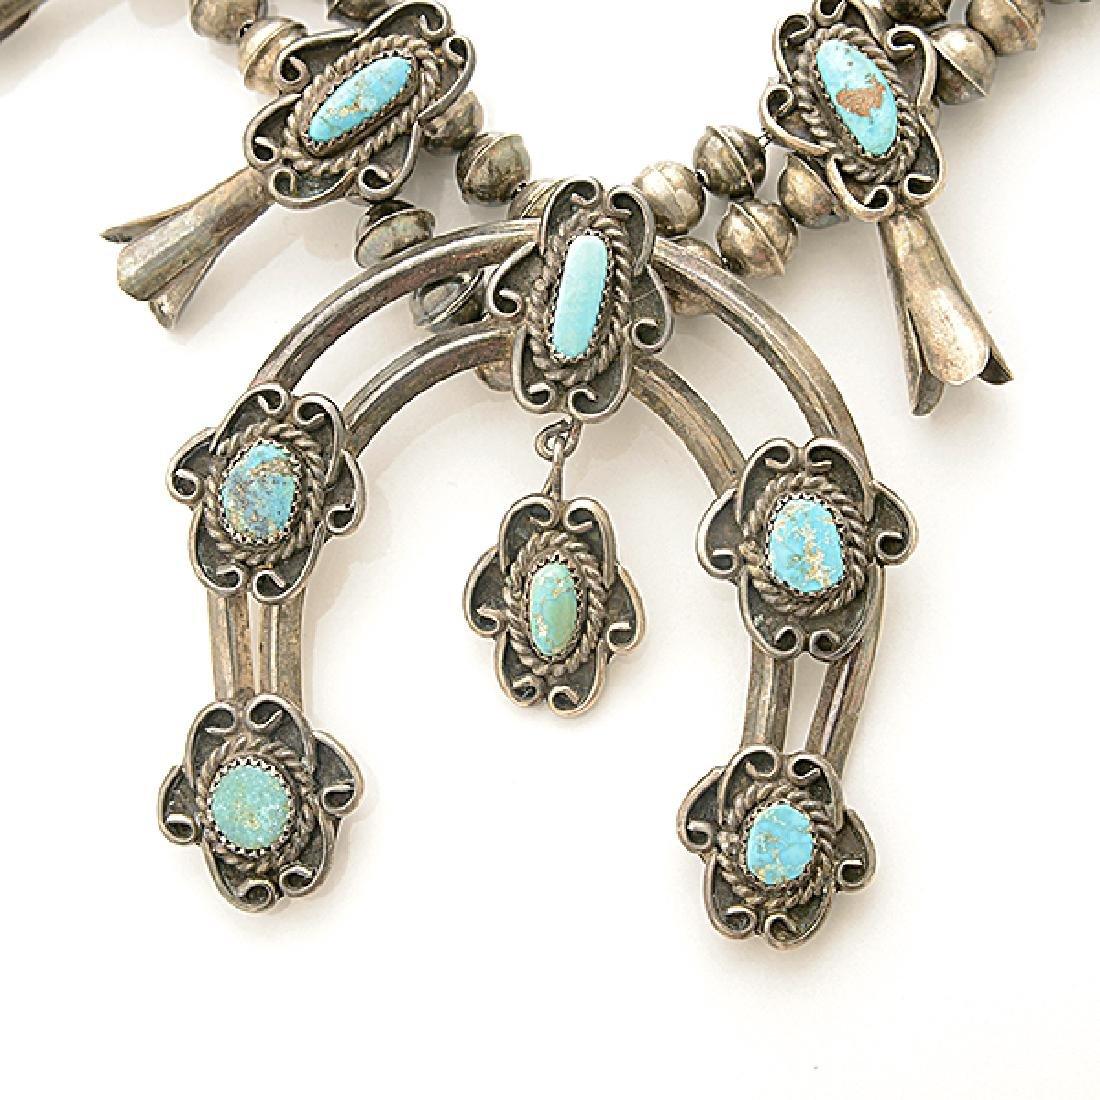 Native American Turquoise, Silver Squash Blossom - 2